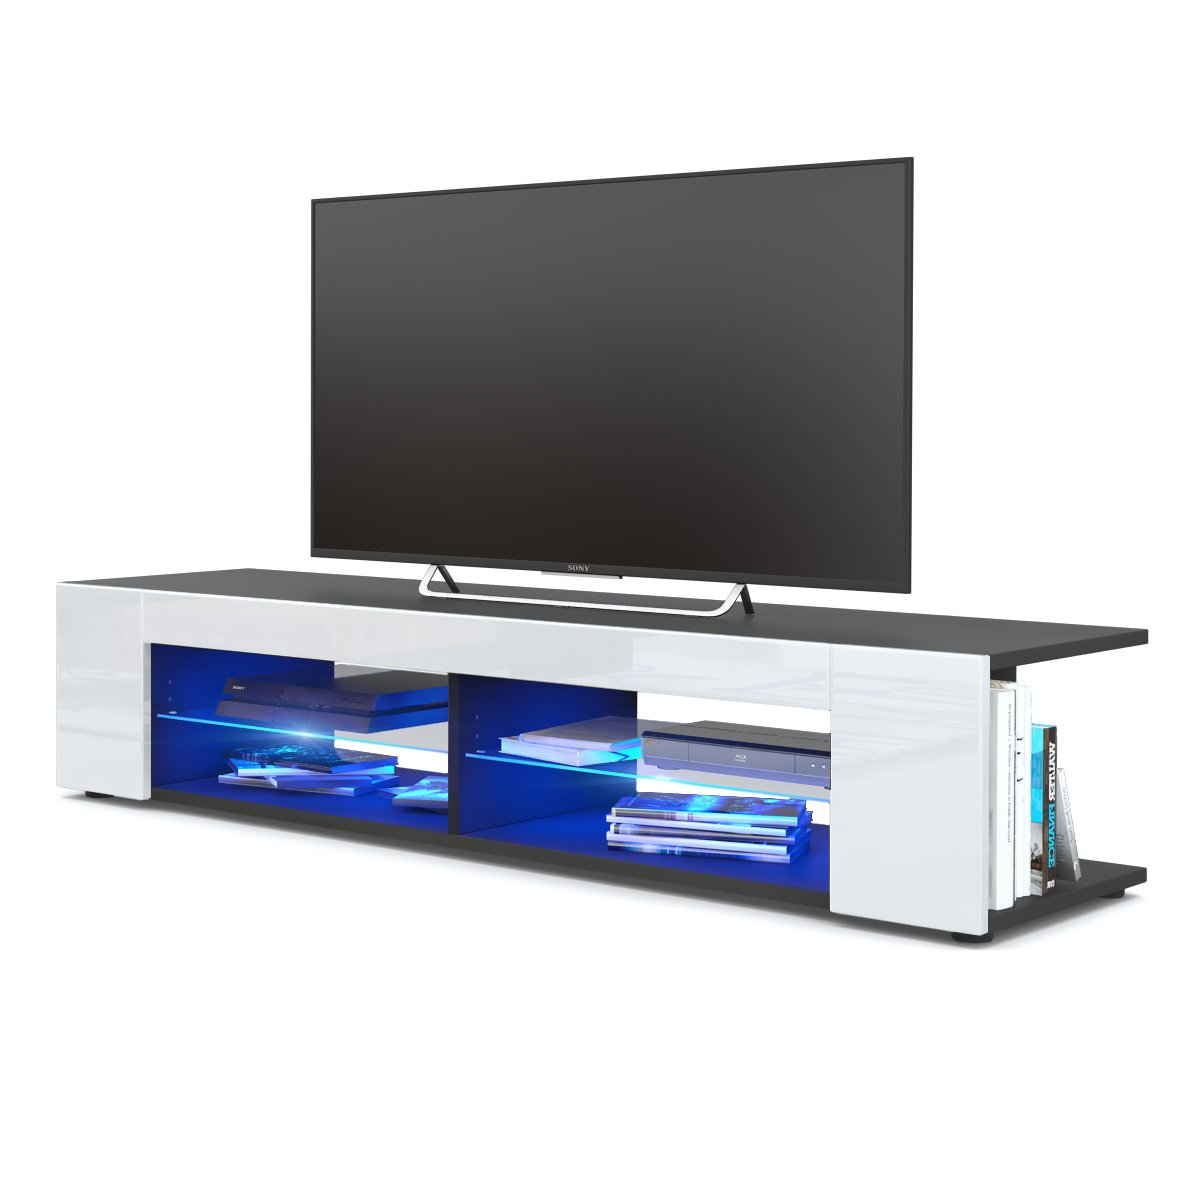 TV Board Lowboard Movie, Korpus in Schwarz matt/Fronten in Weiß Hochglanz inkl. LED Beleuchtung in Blau